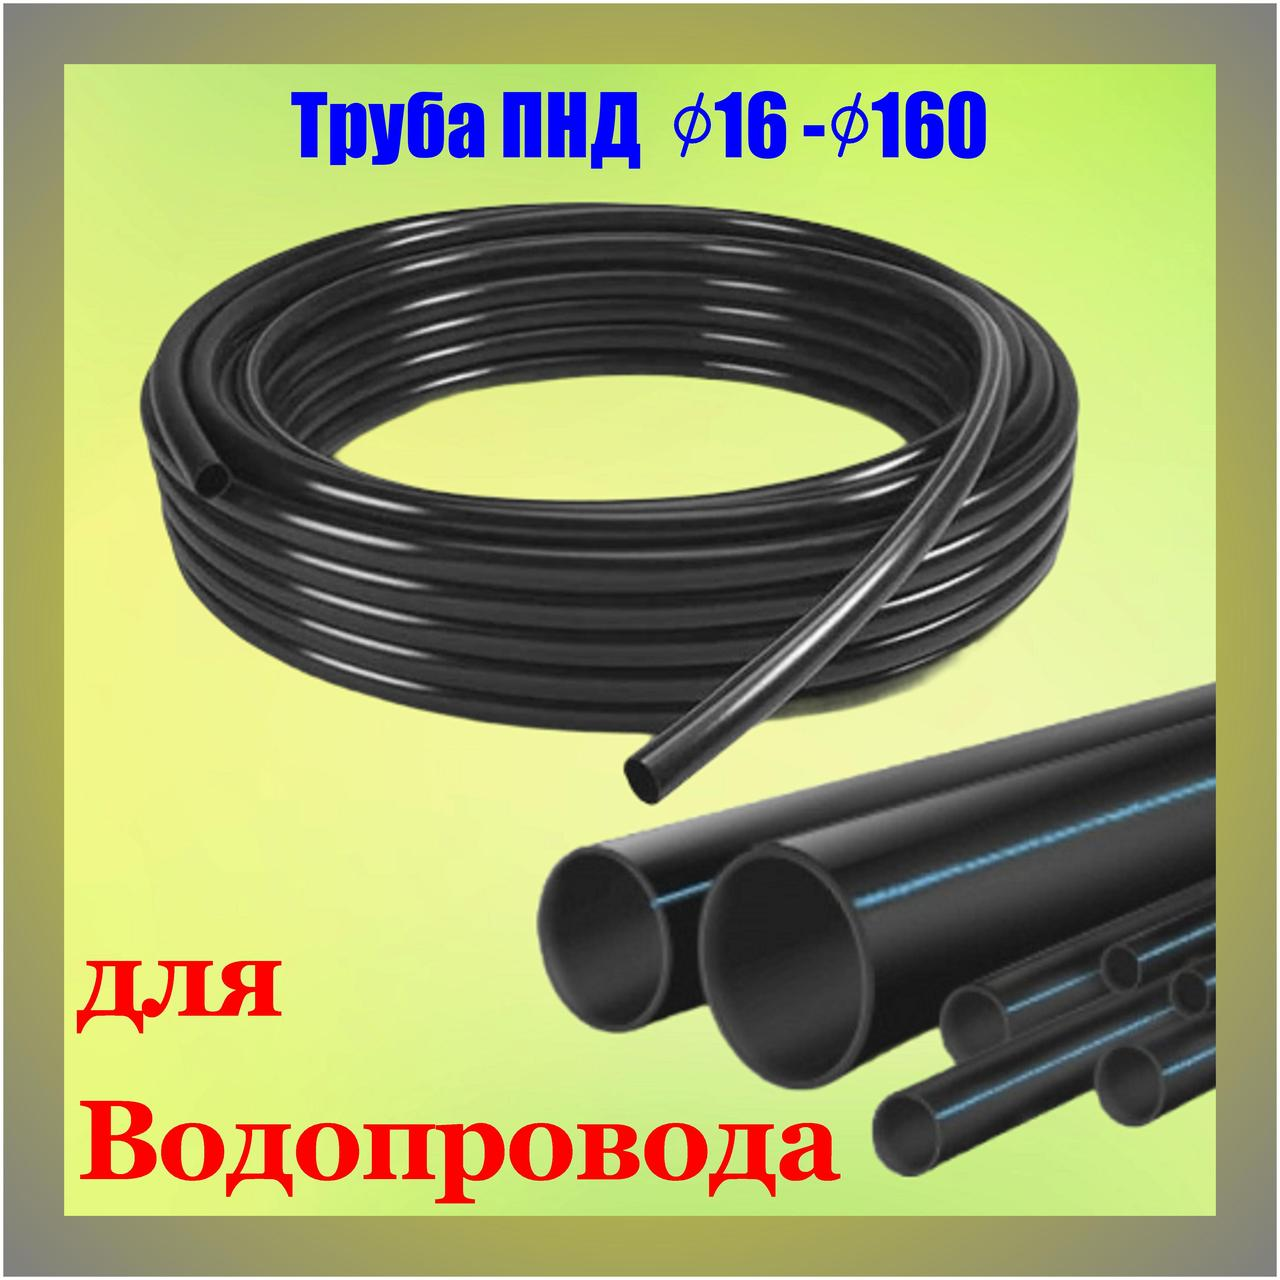 Труба ПНД 110 мм для водоснабжения